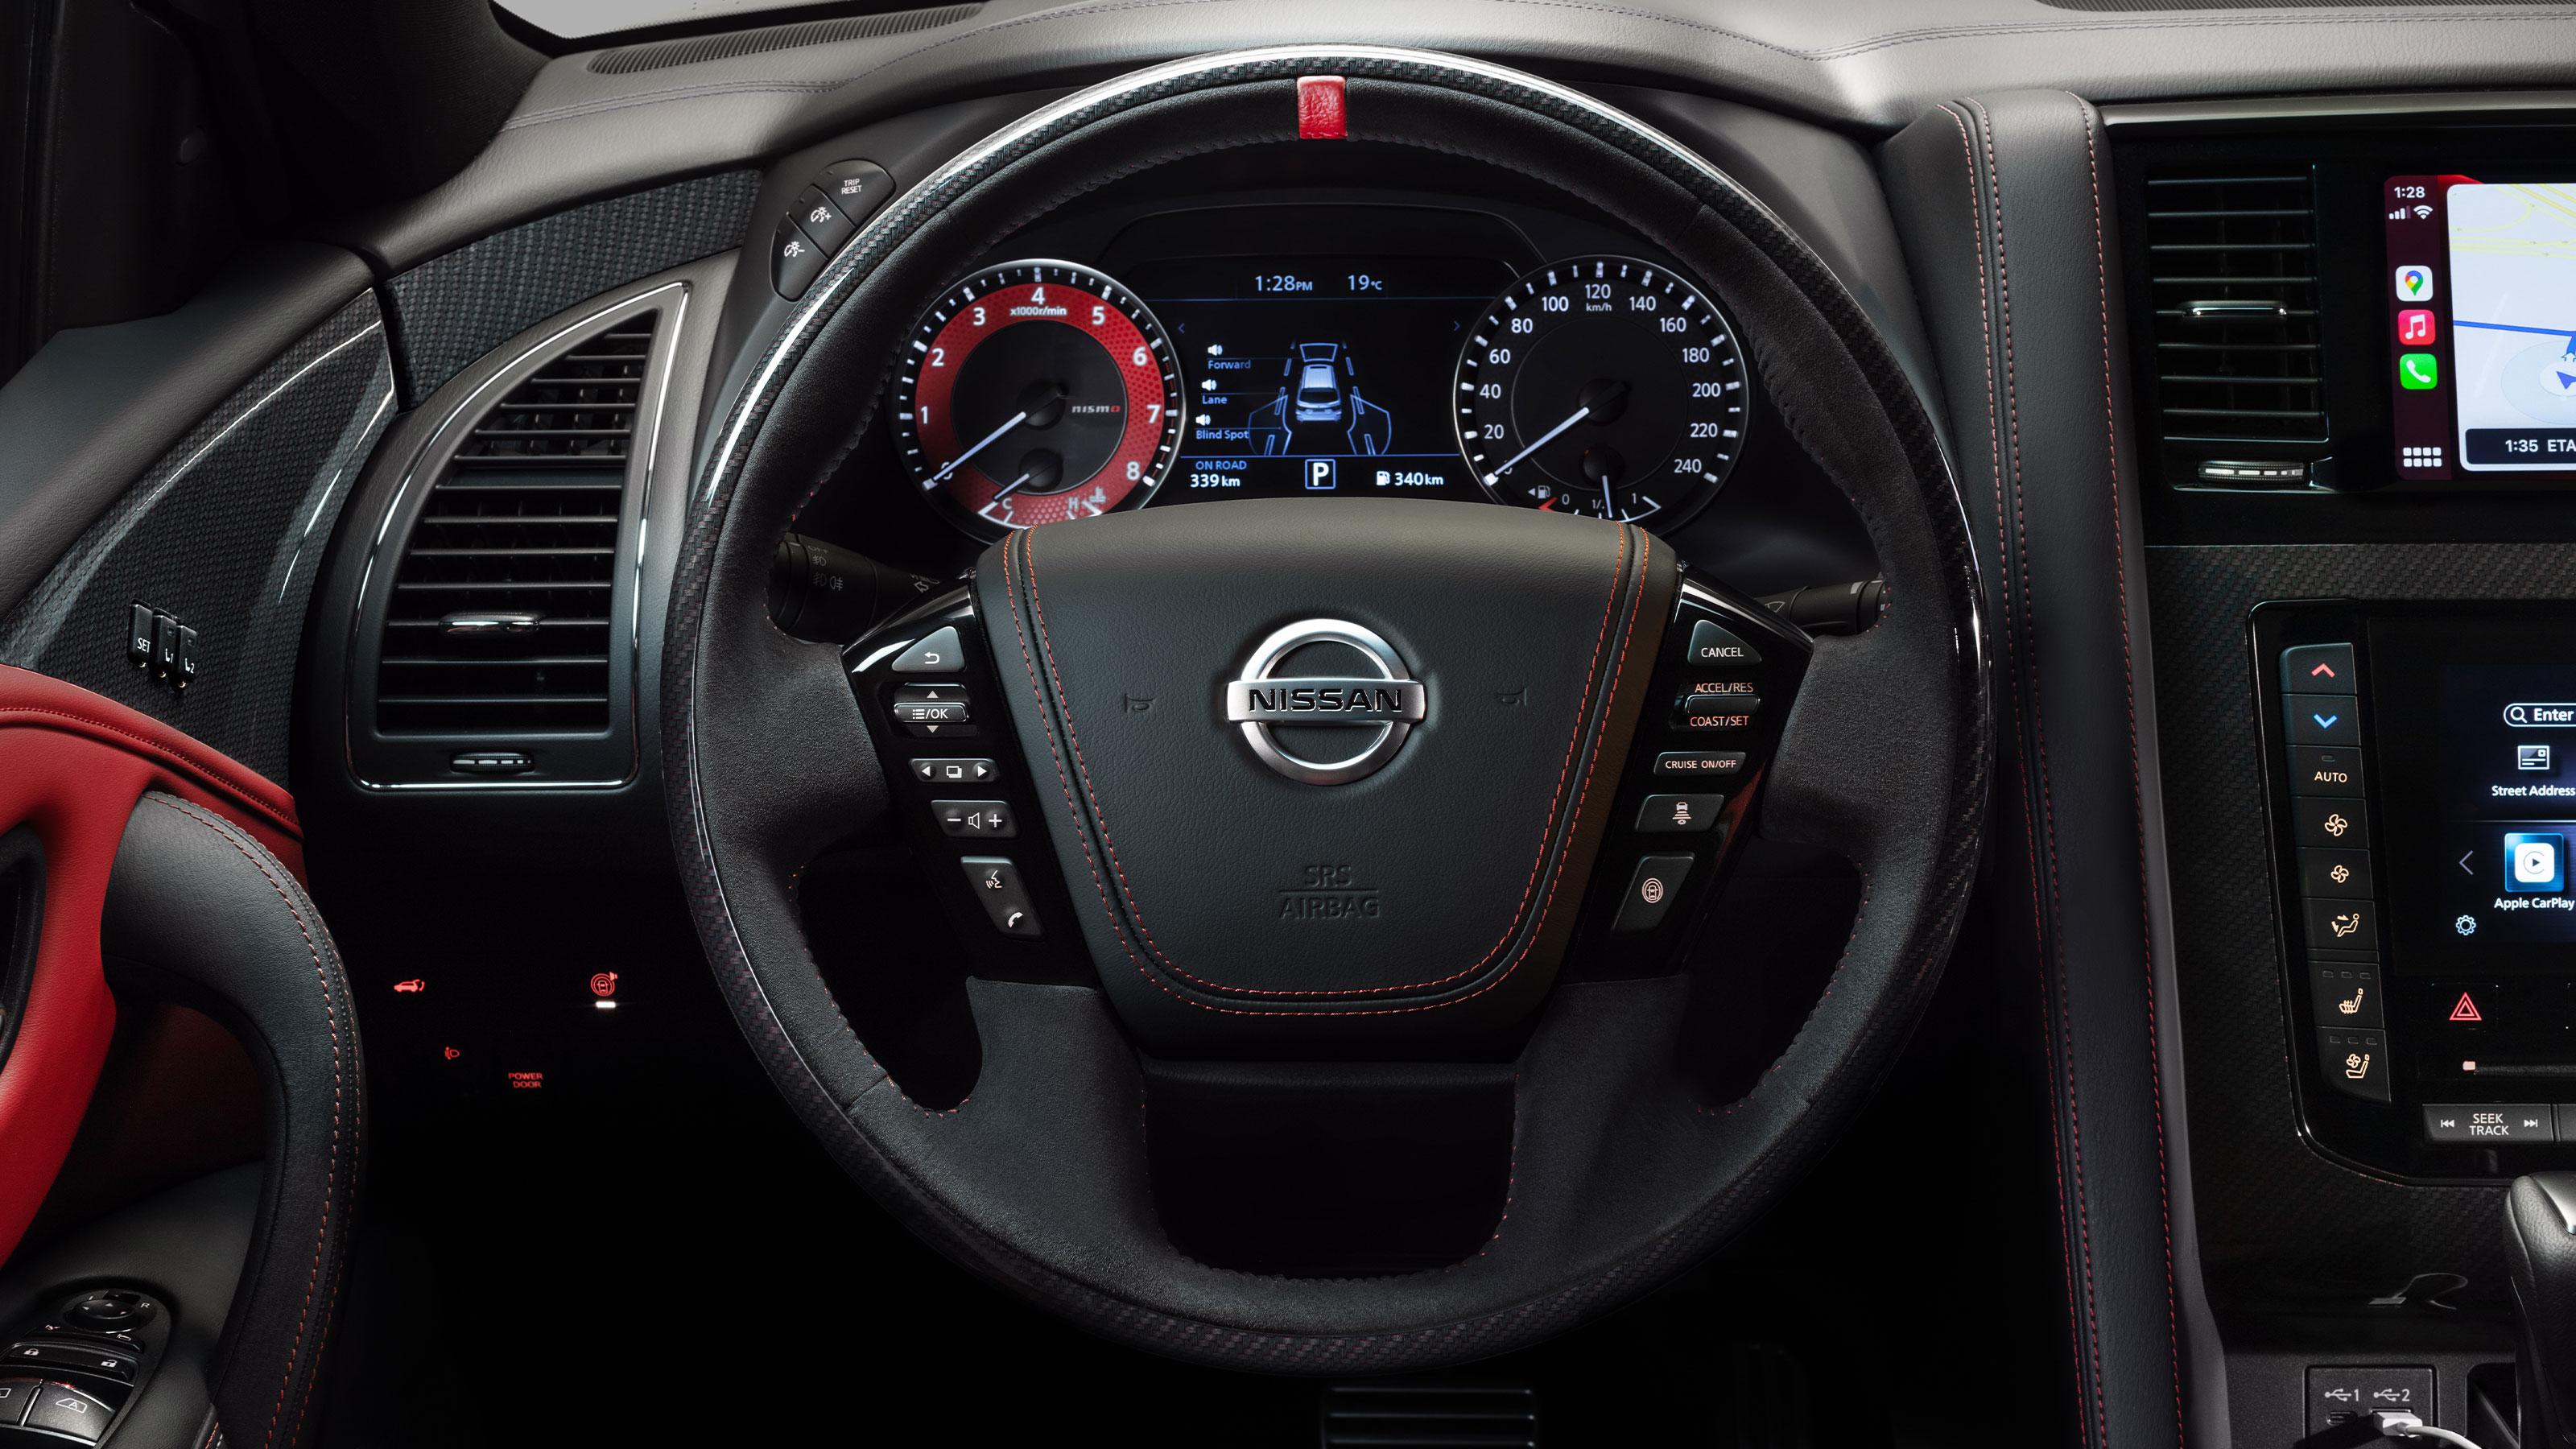 Nissan PATROL NISMO interior dashboard